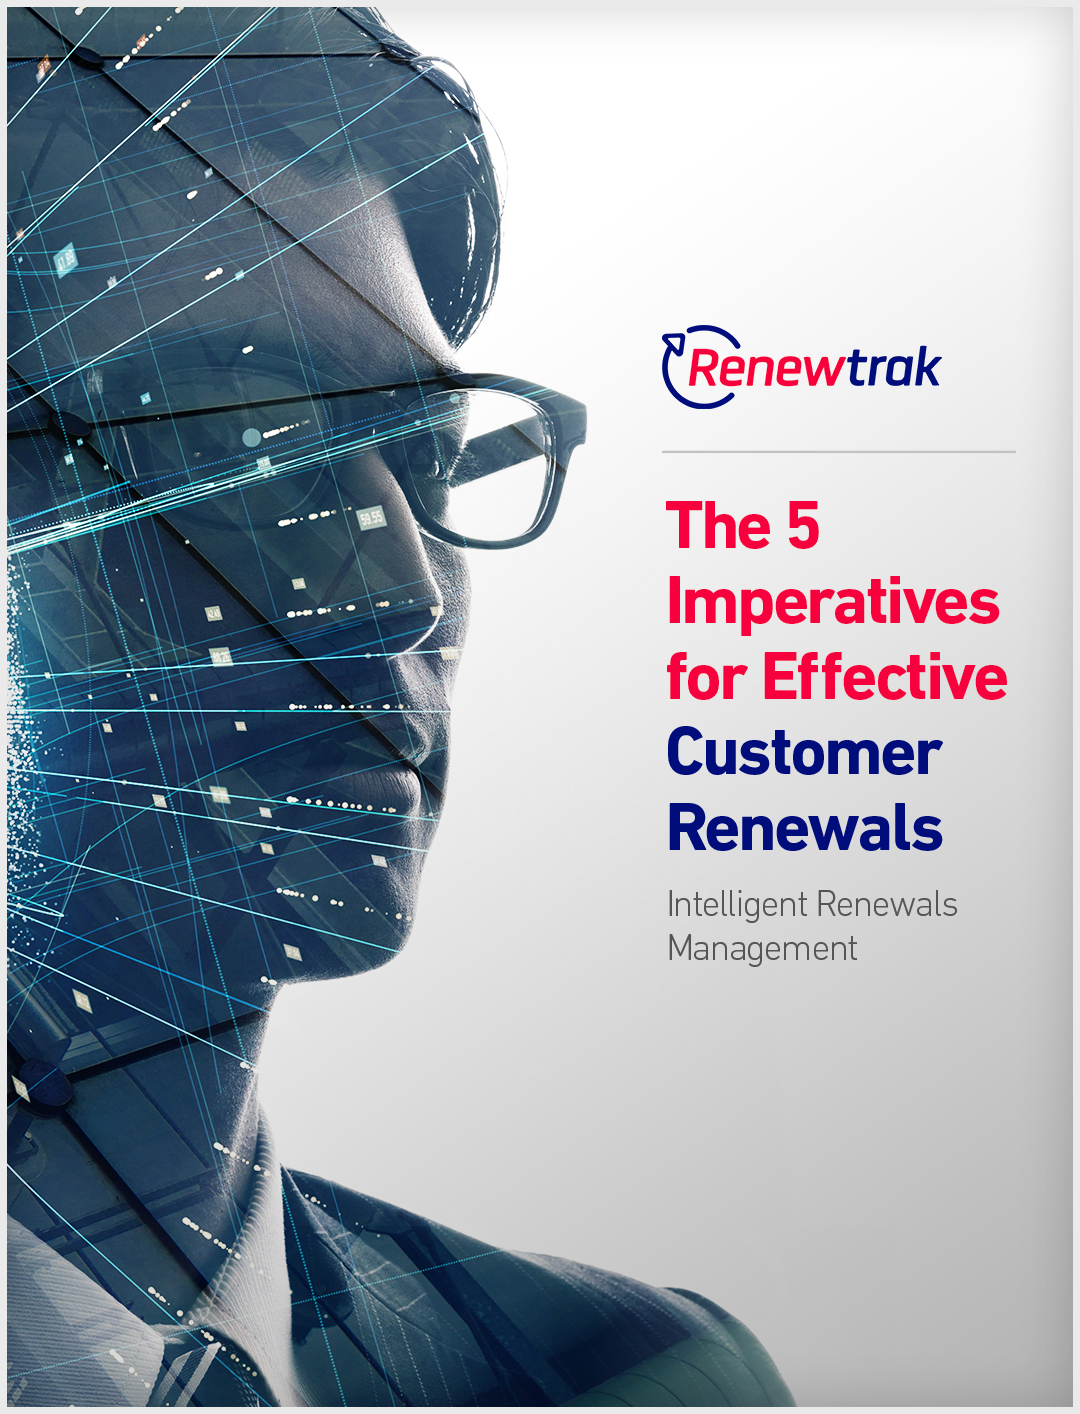 Renewtrak 5 imperatives